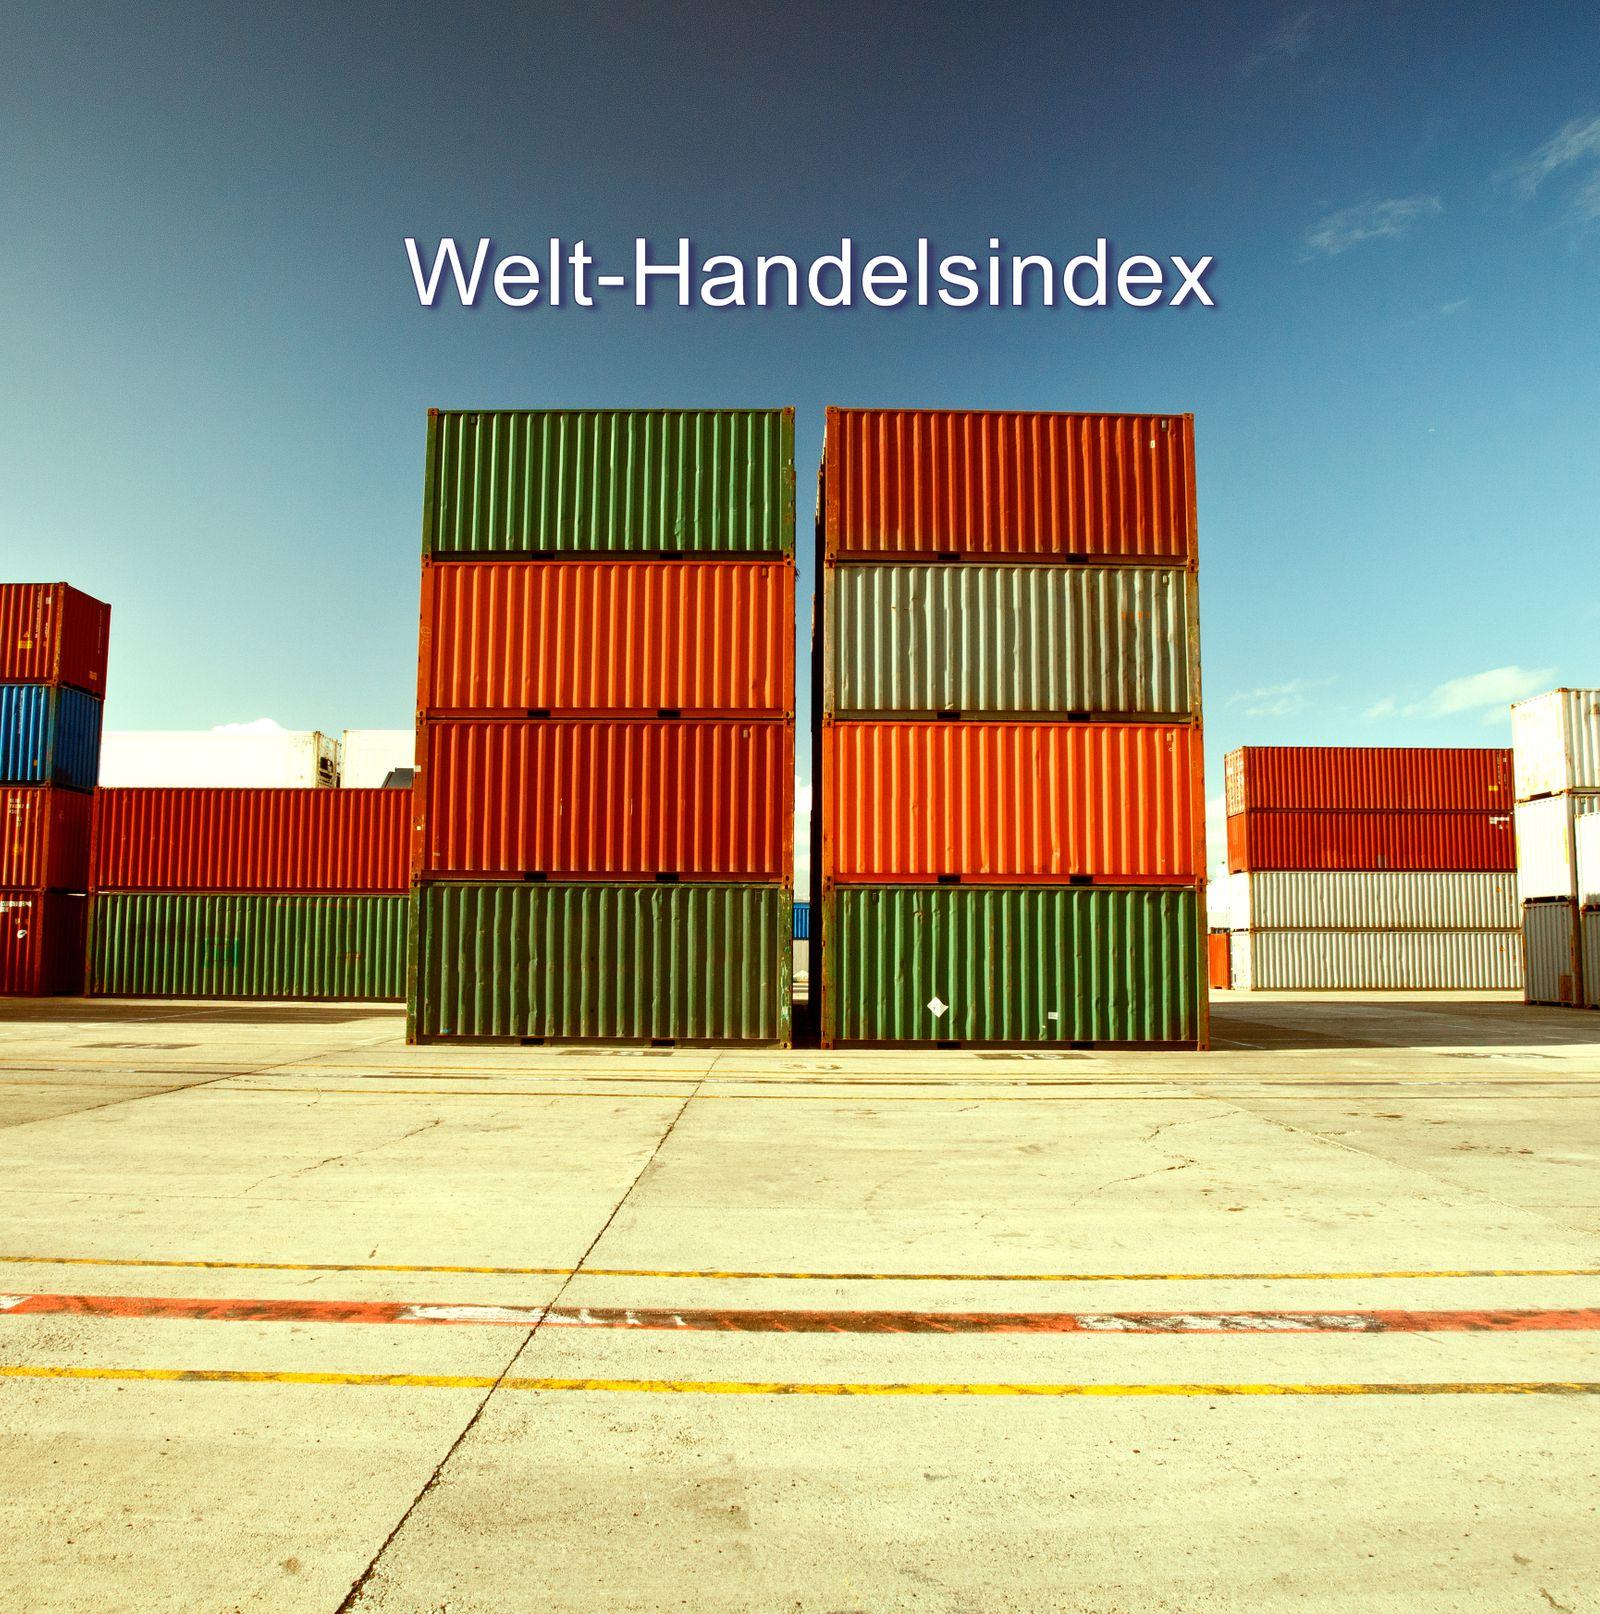 [M] Welt-Handelsindex